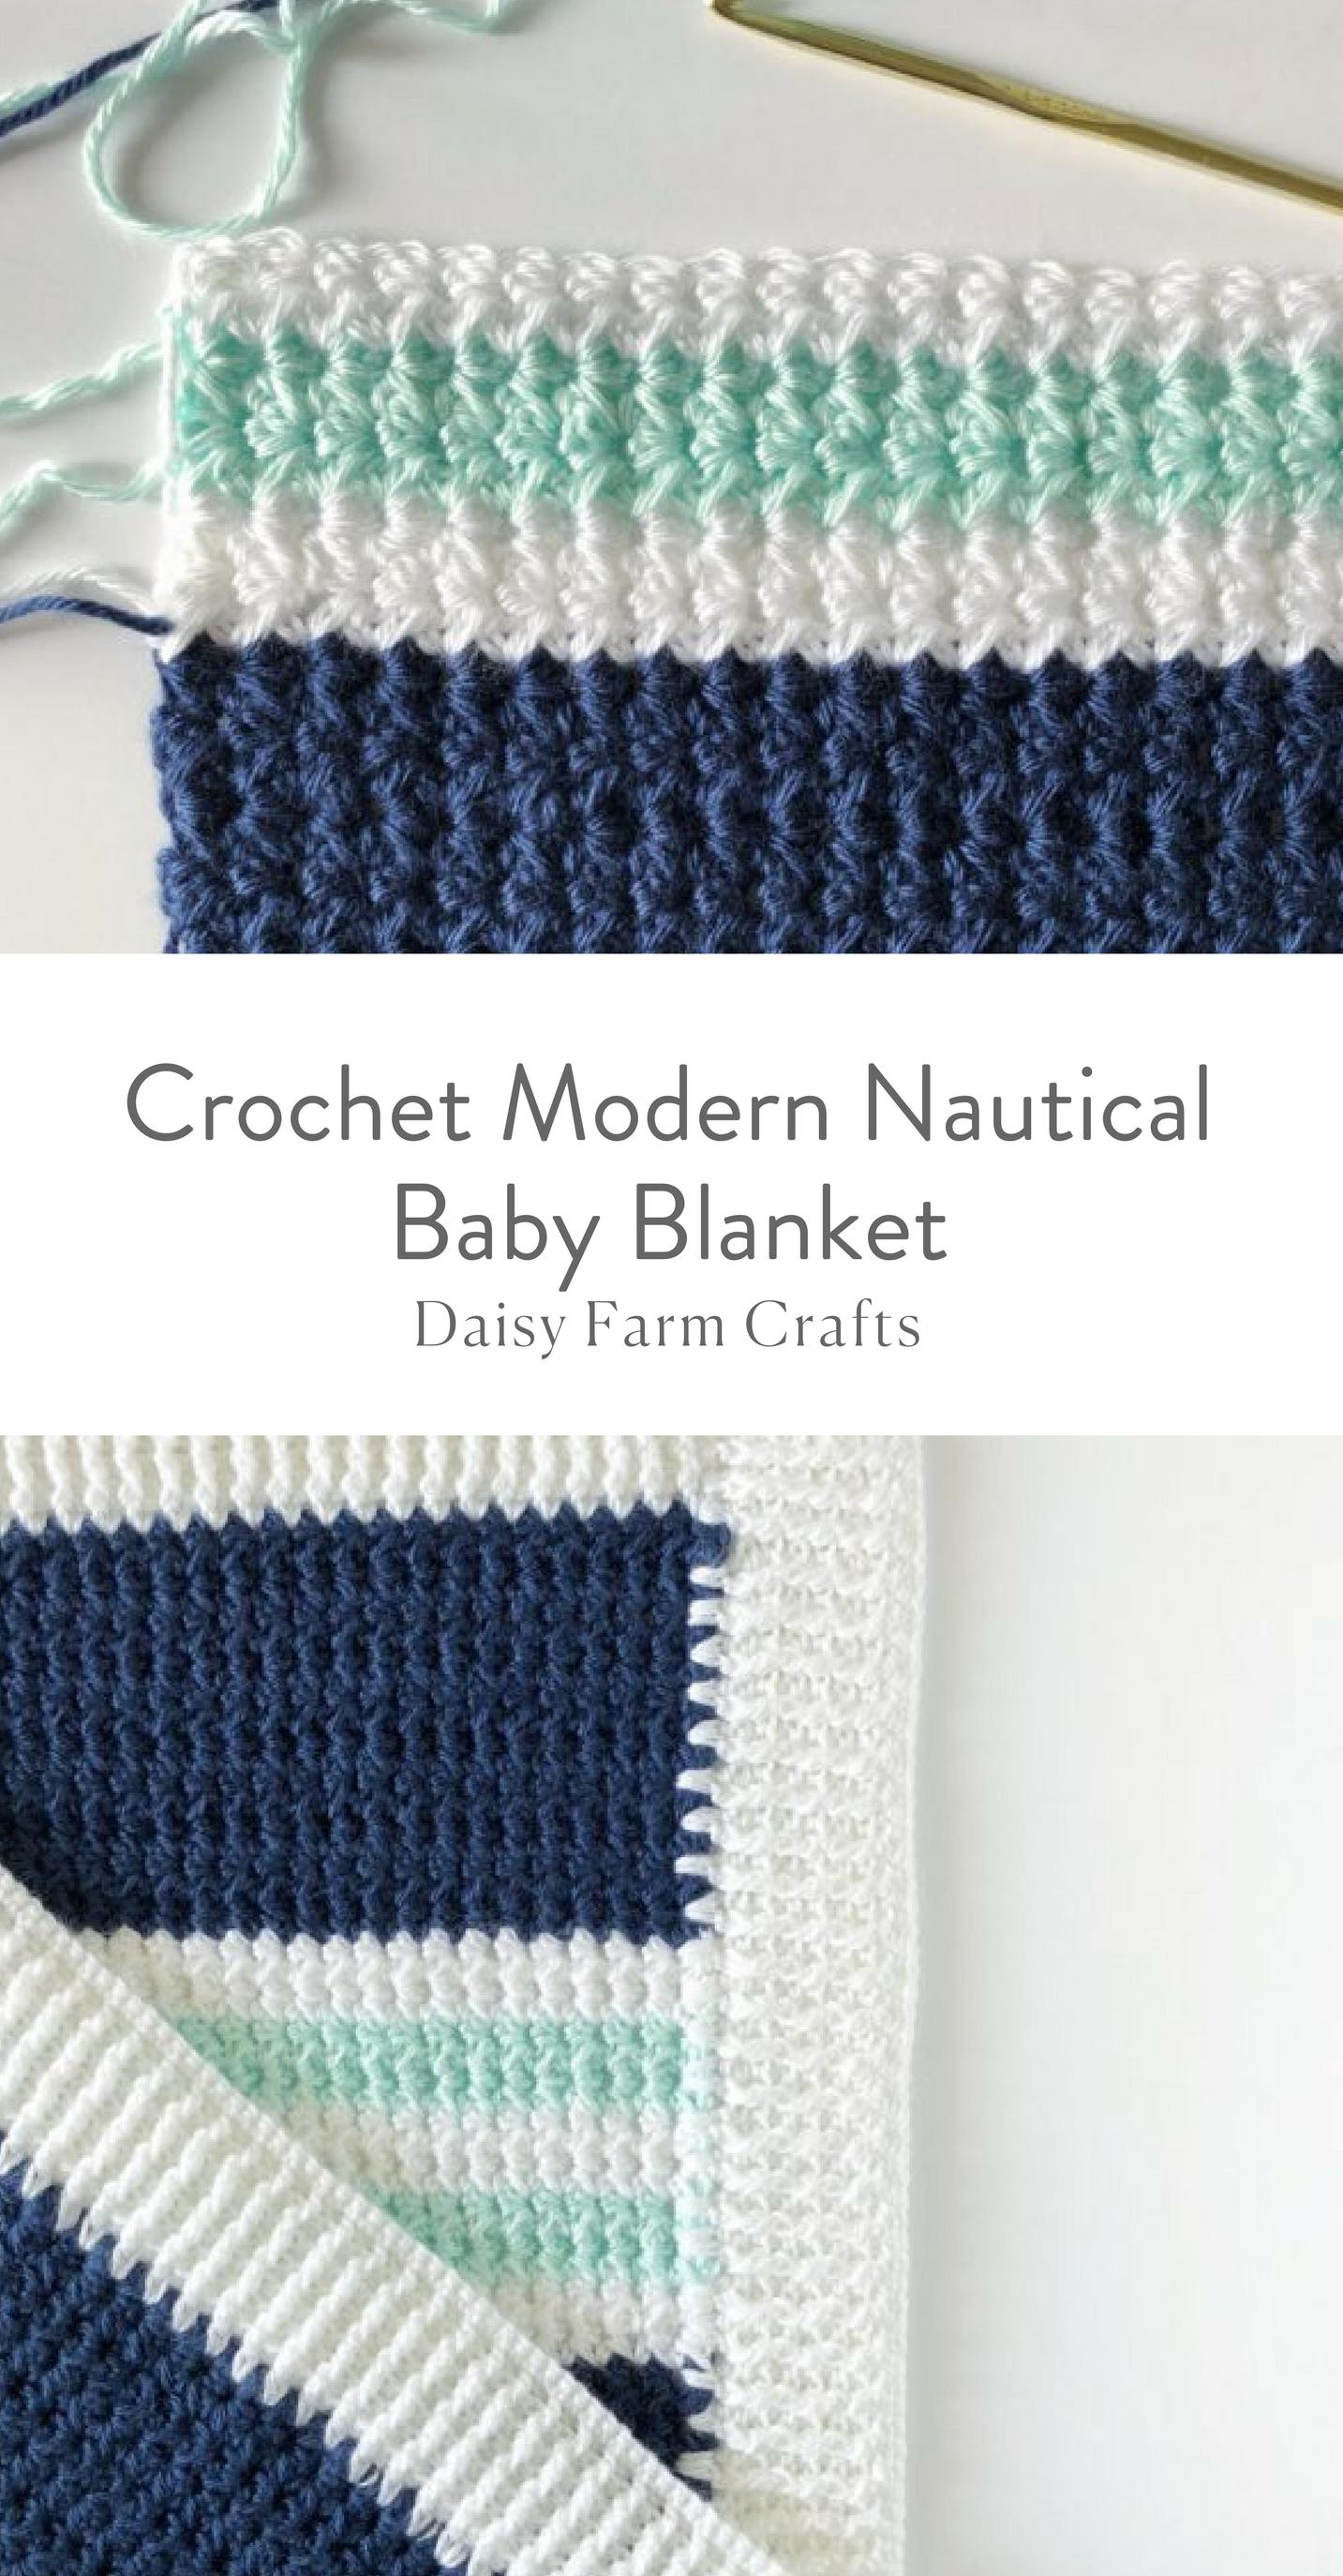 Free Pattern - Crochet Modern Nautical Baby Blanket | Crochet and ...